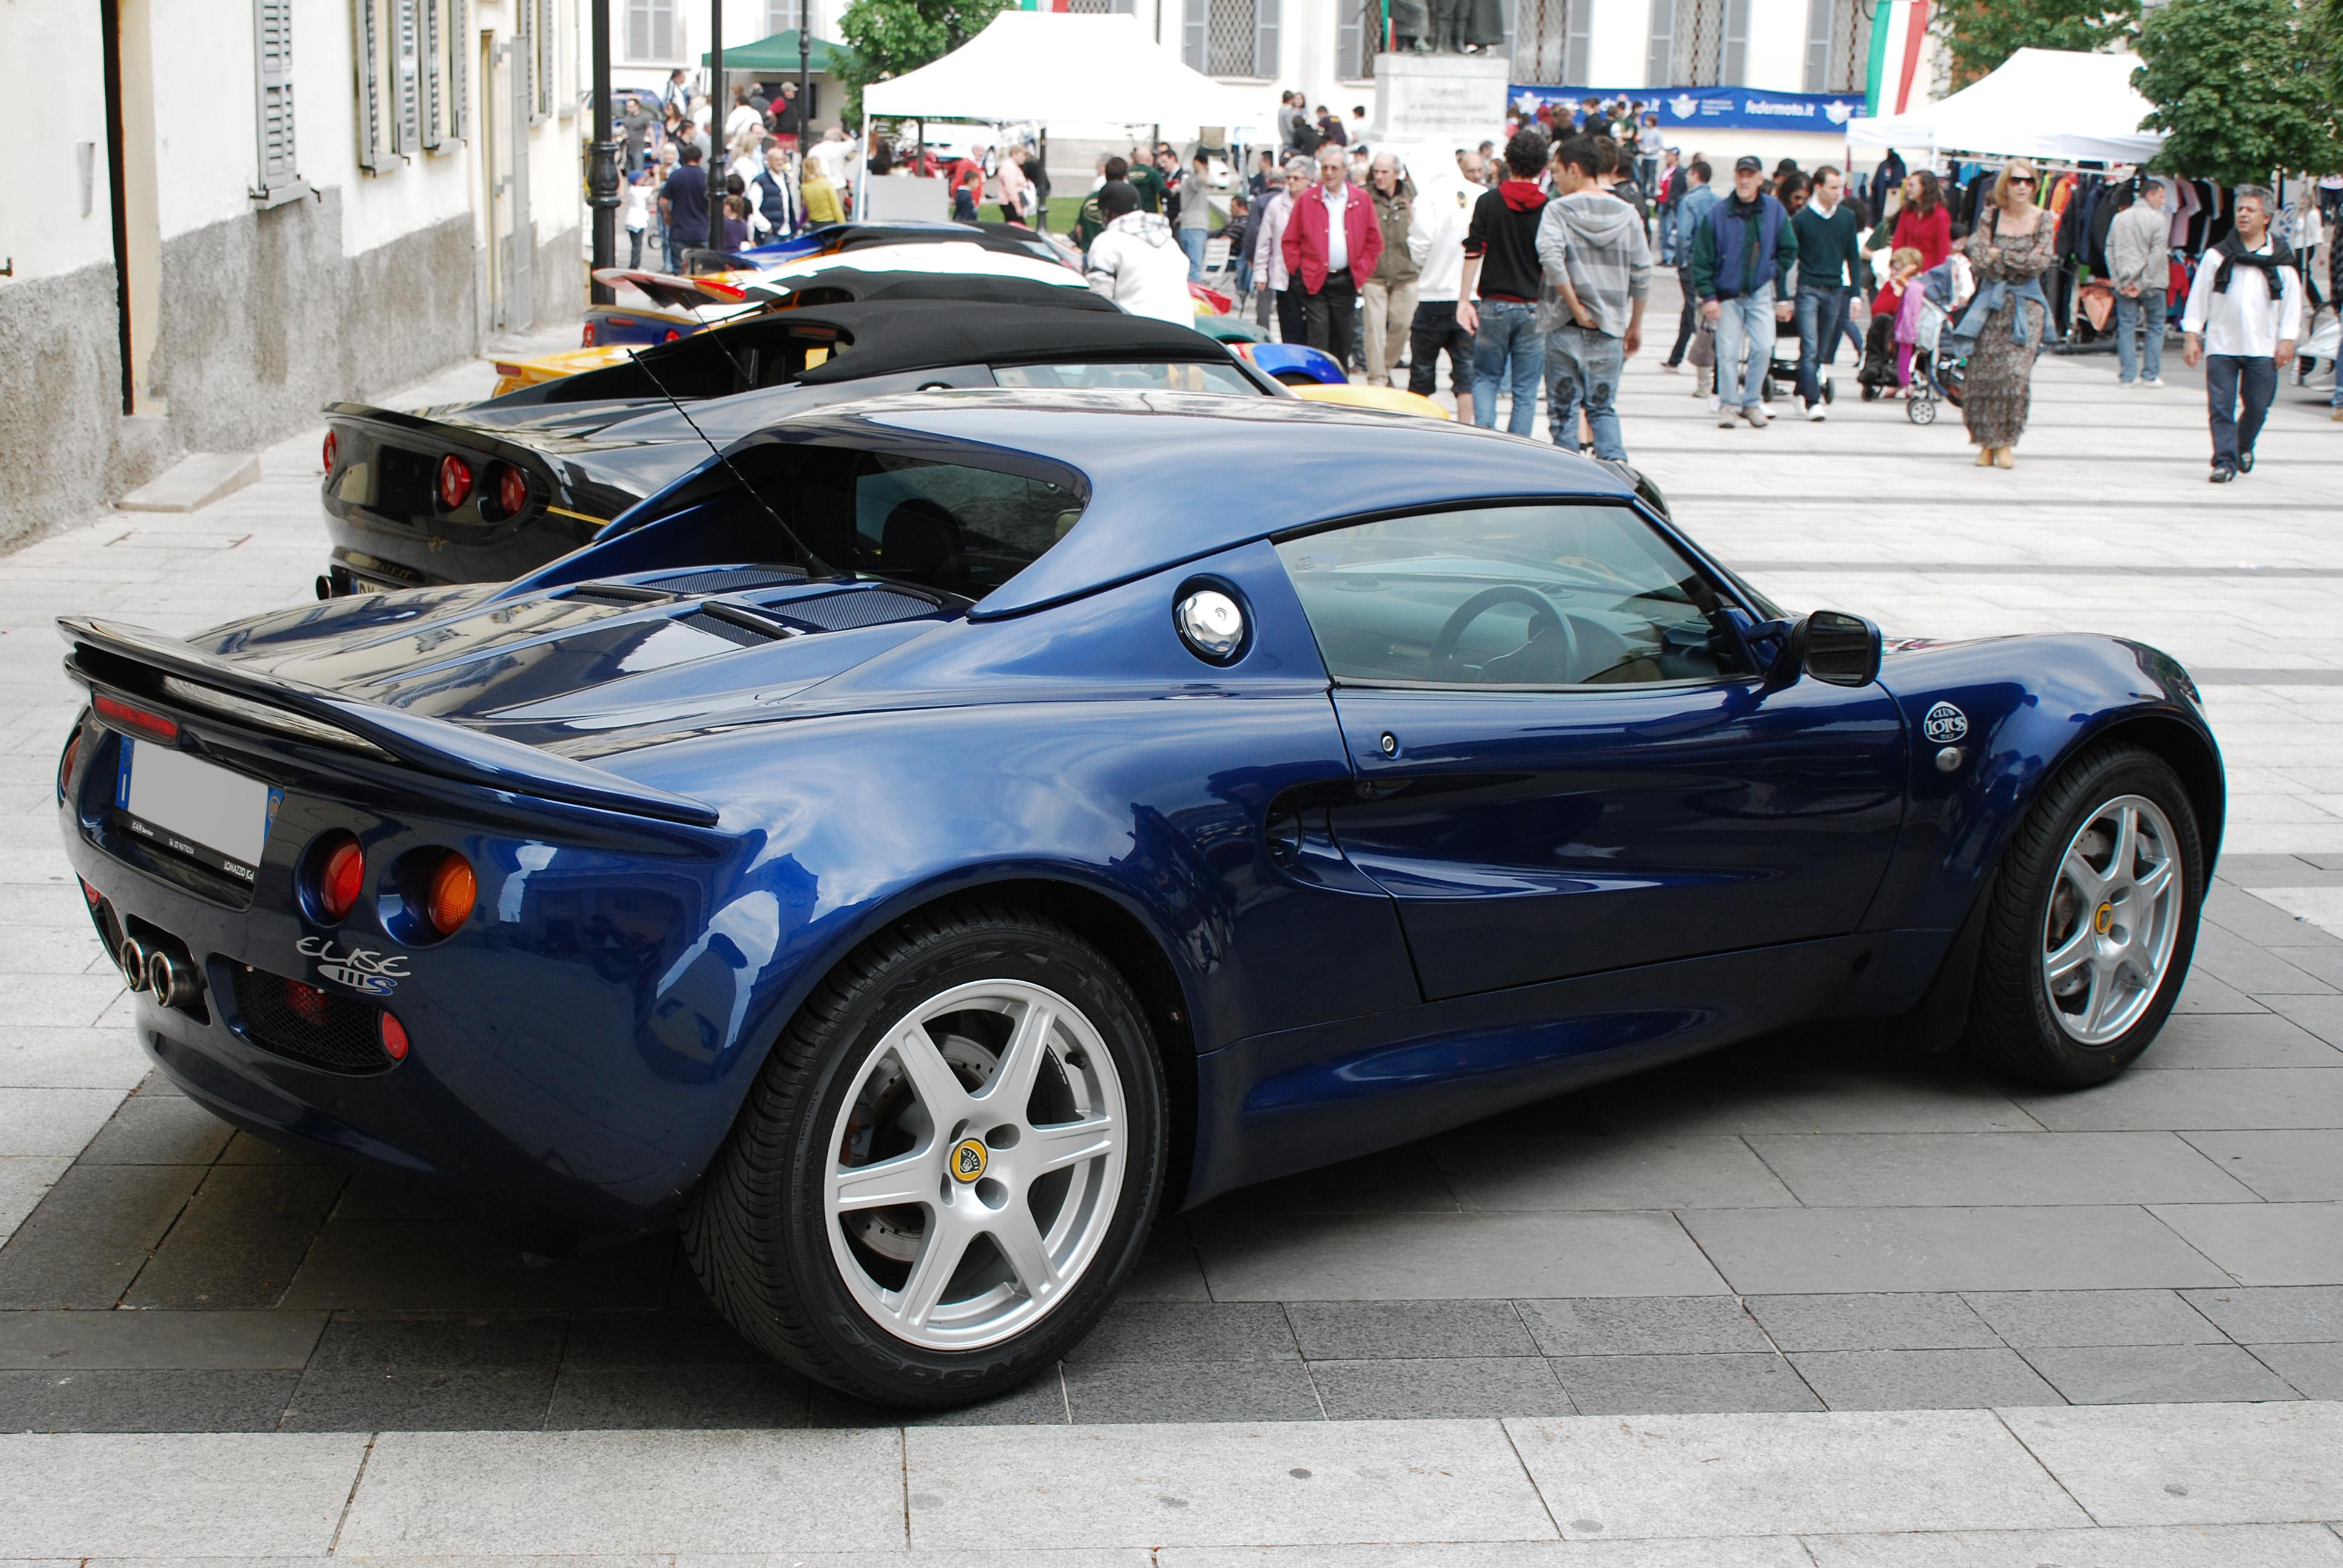 File:Lotus Elise 111S.JPG - Wikimedia Commons